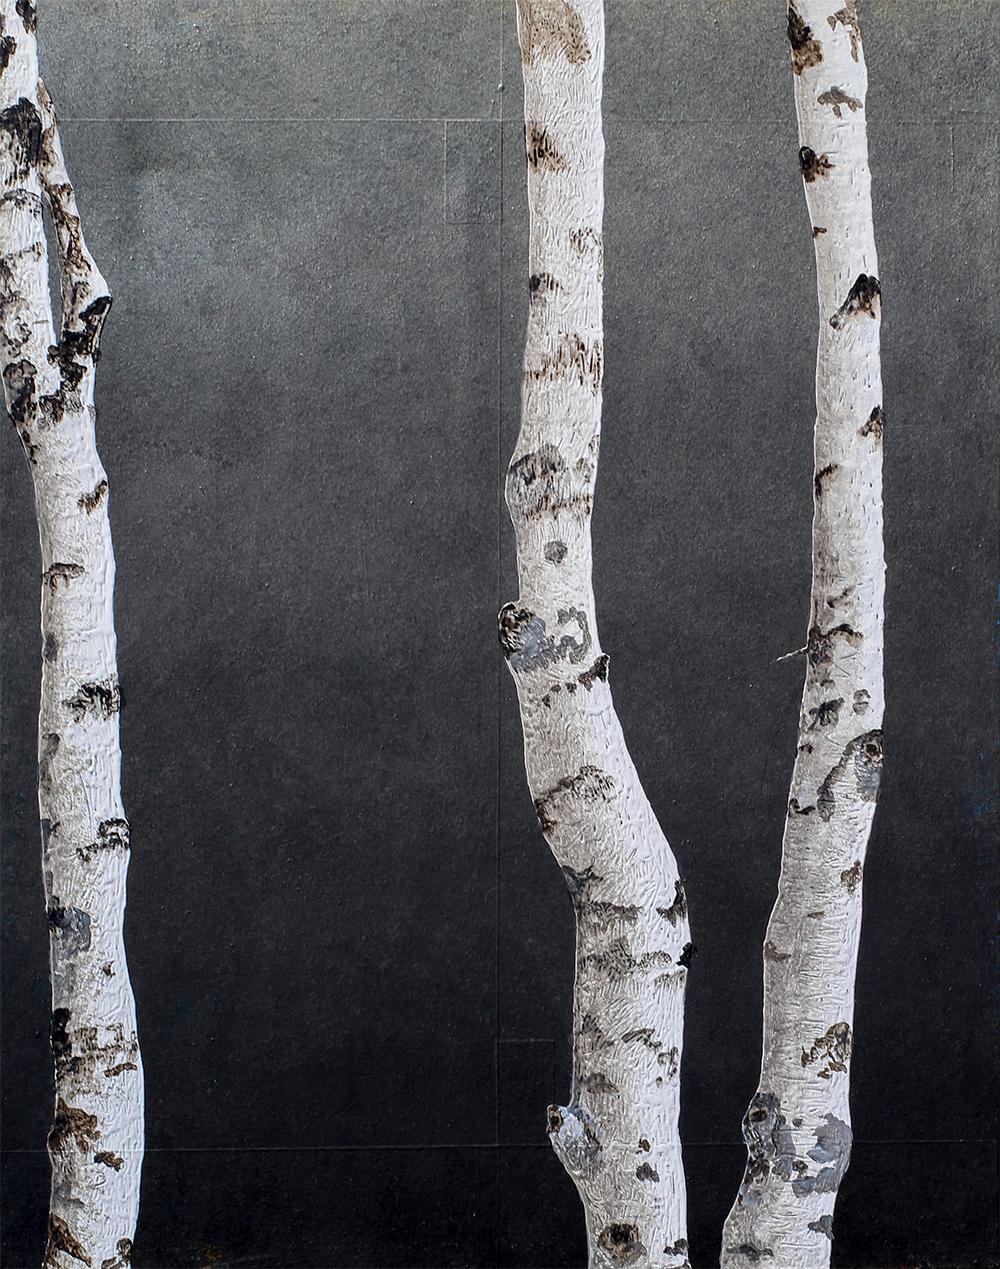 Birches III: Contemporary Minimalist Painting of Slender Birches